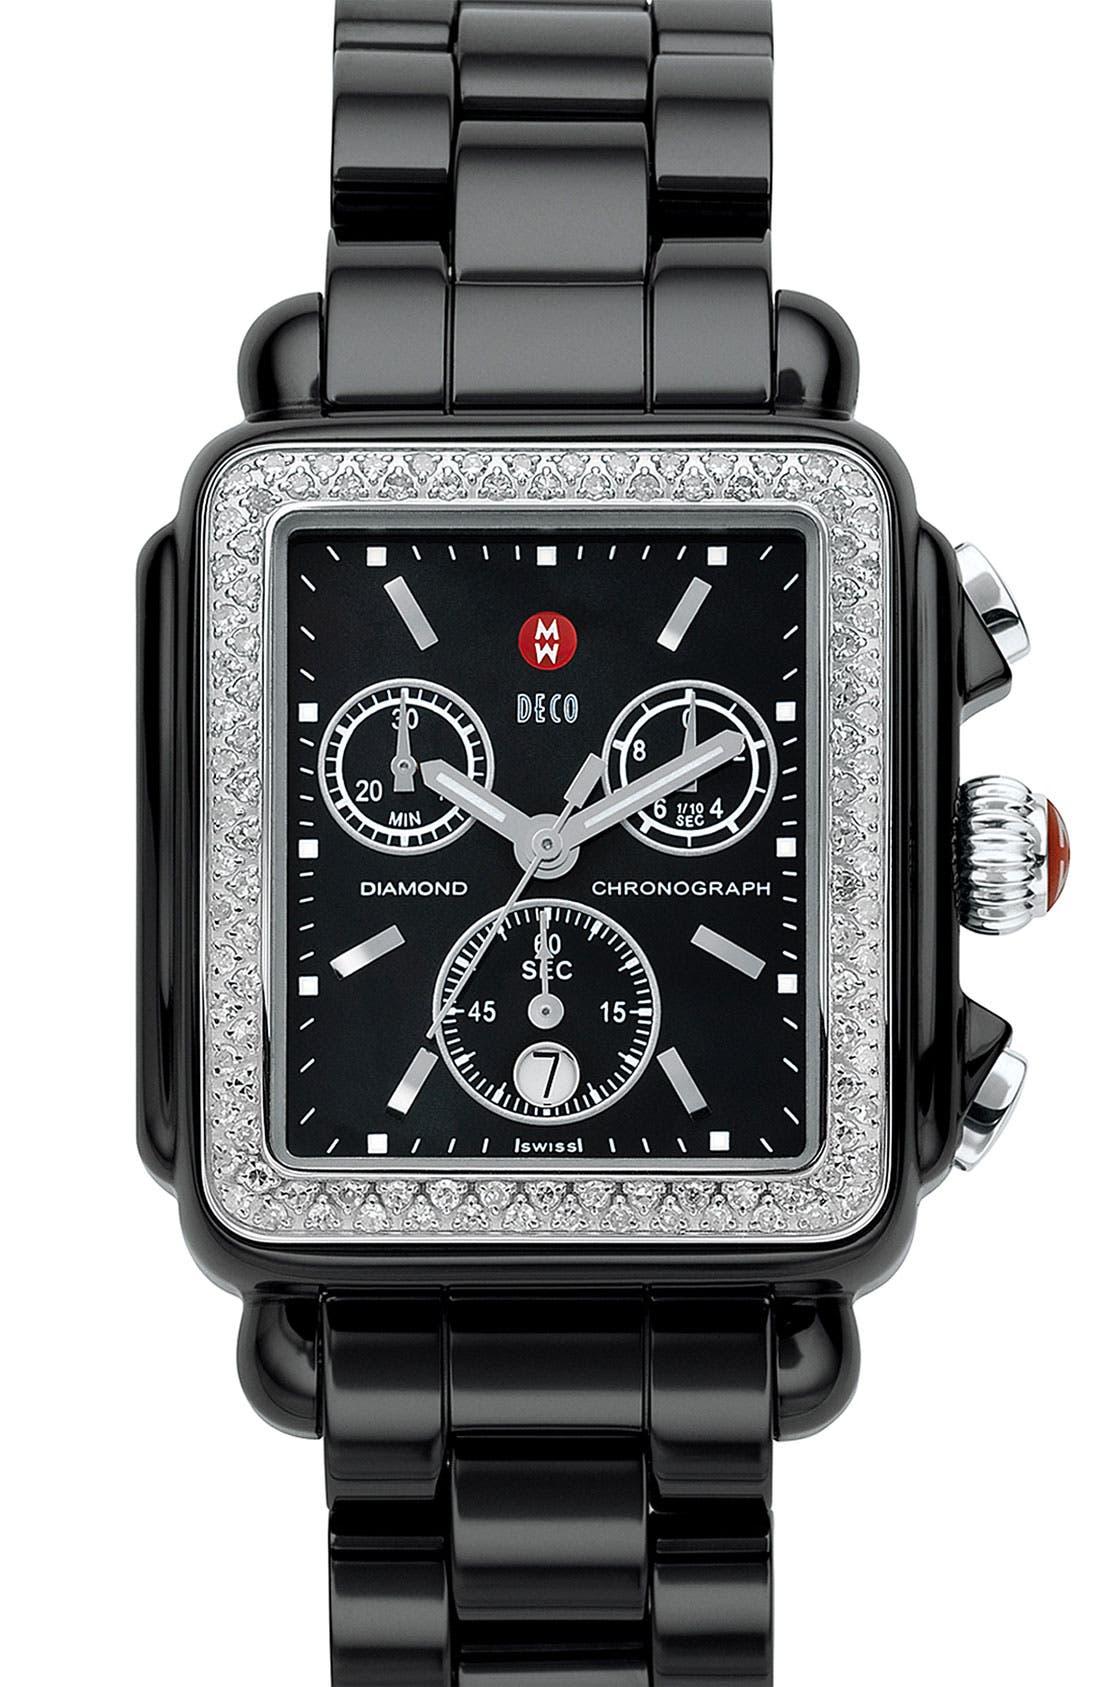 Main Image - MICHELE 'Deco Diamond' Ceramic Bracelet Watch, 33mm x 46mm